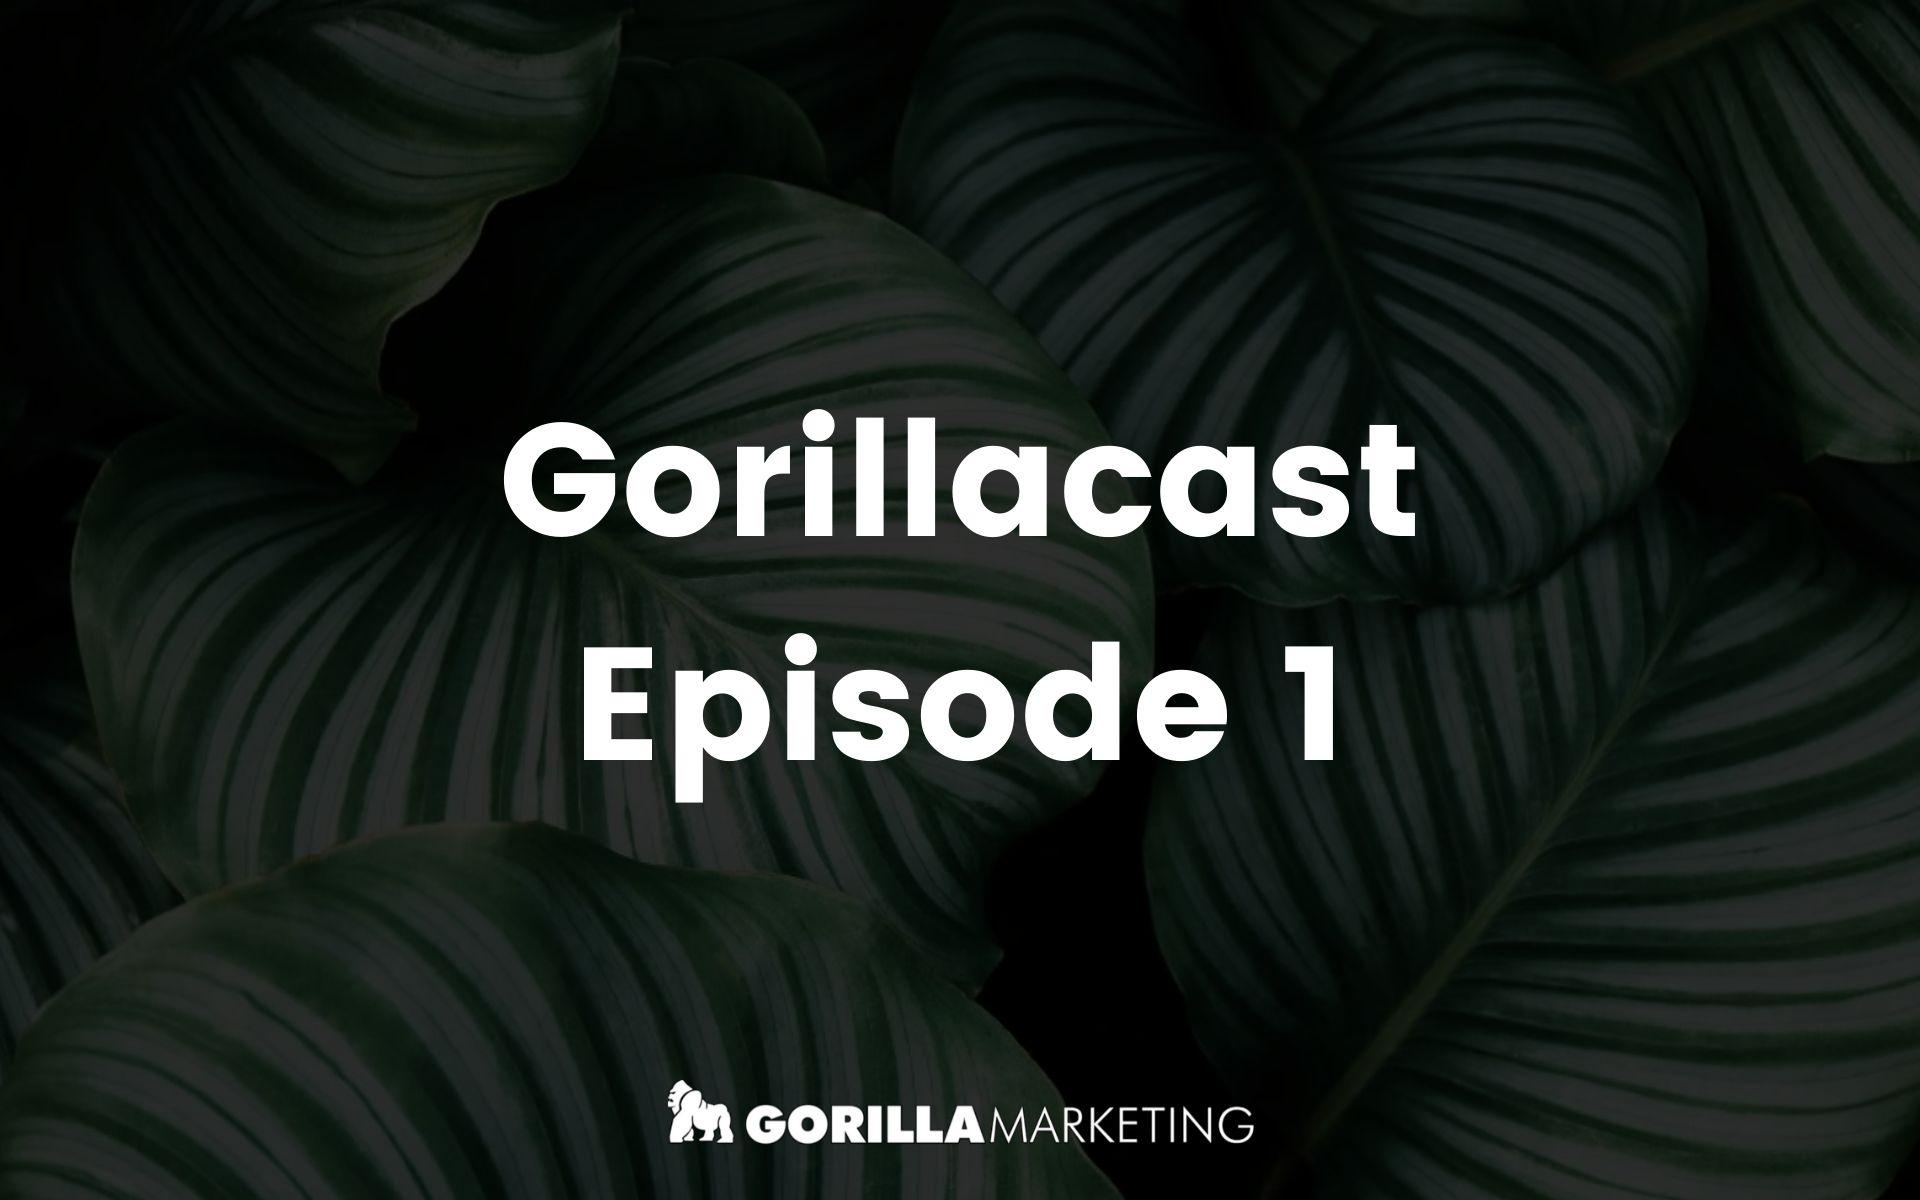 The Gorillacast Episode 1